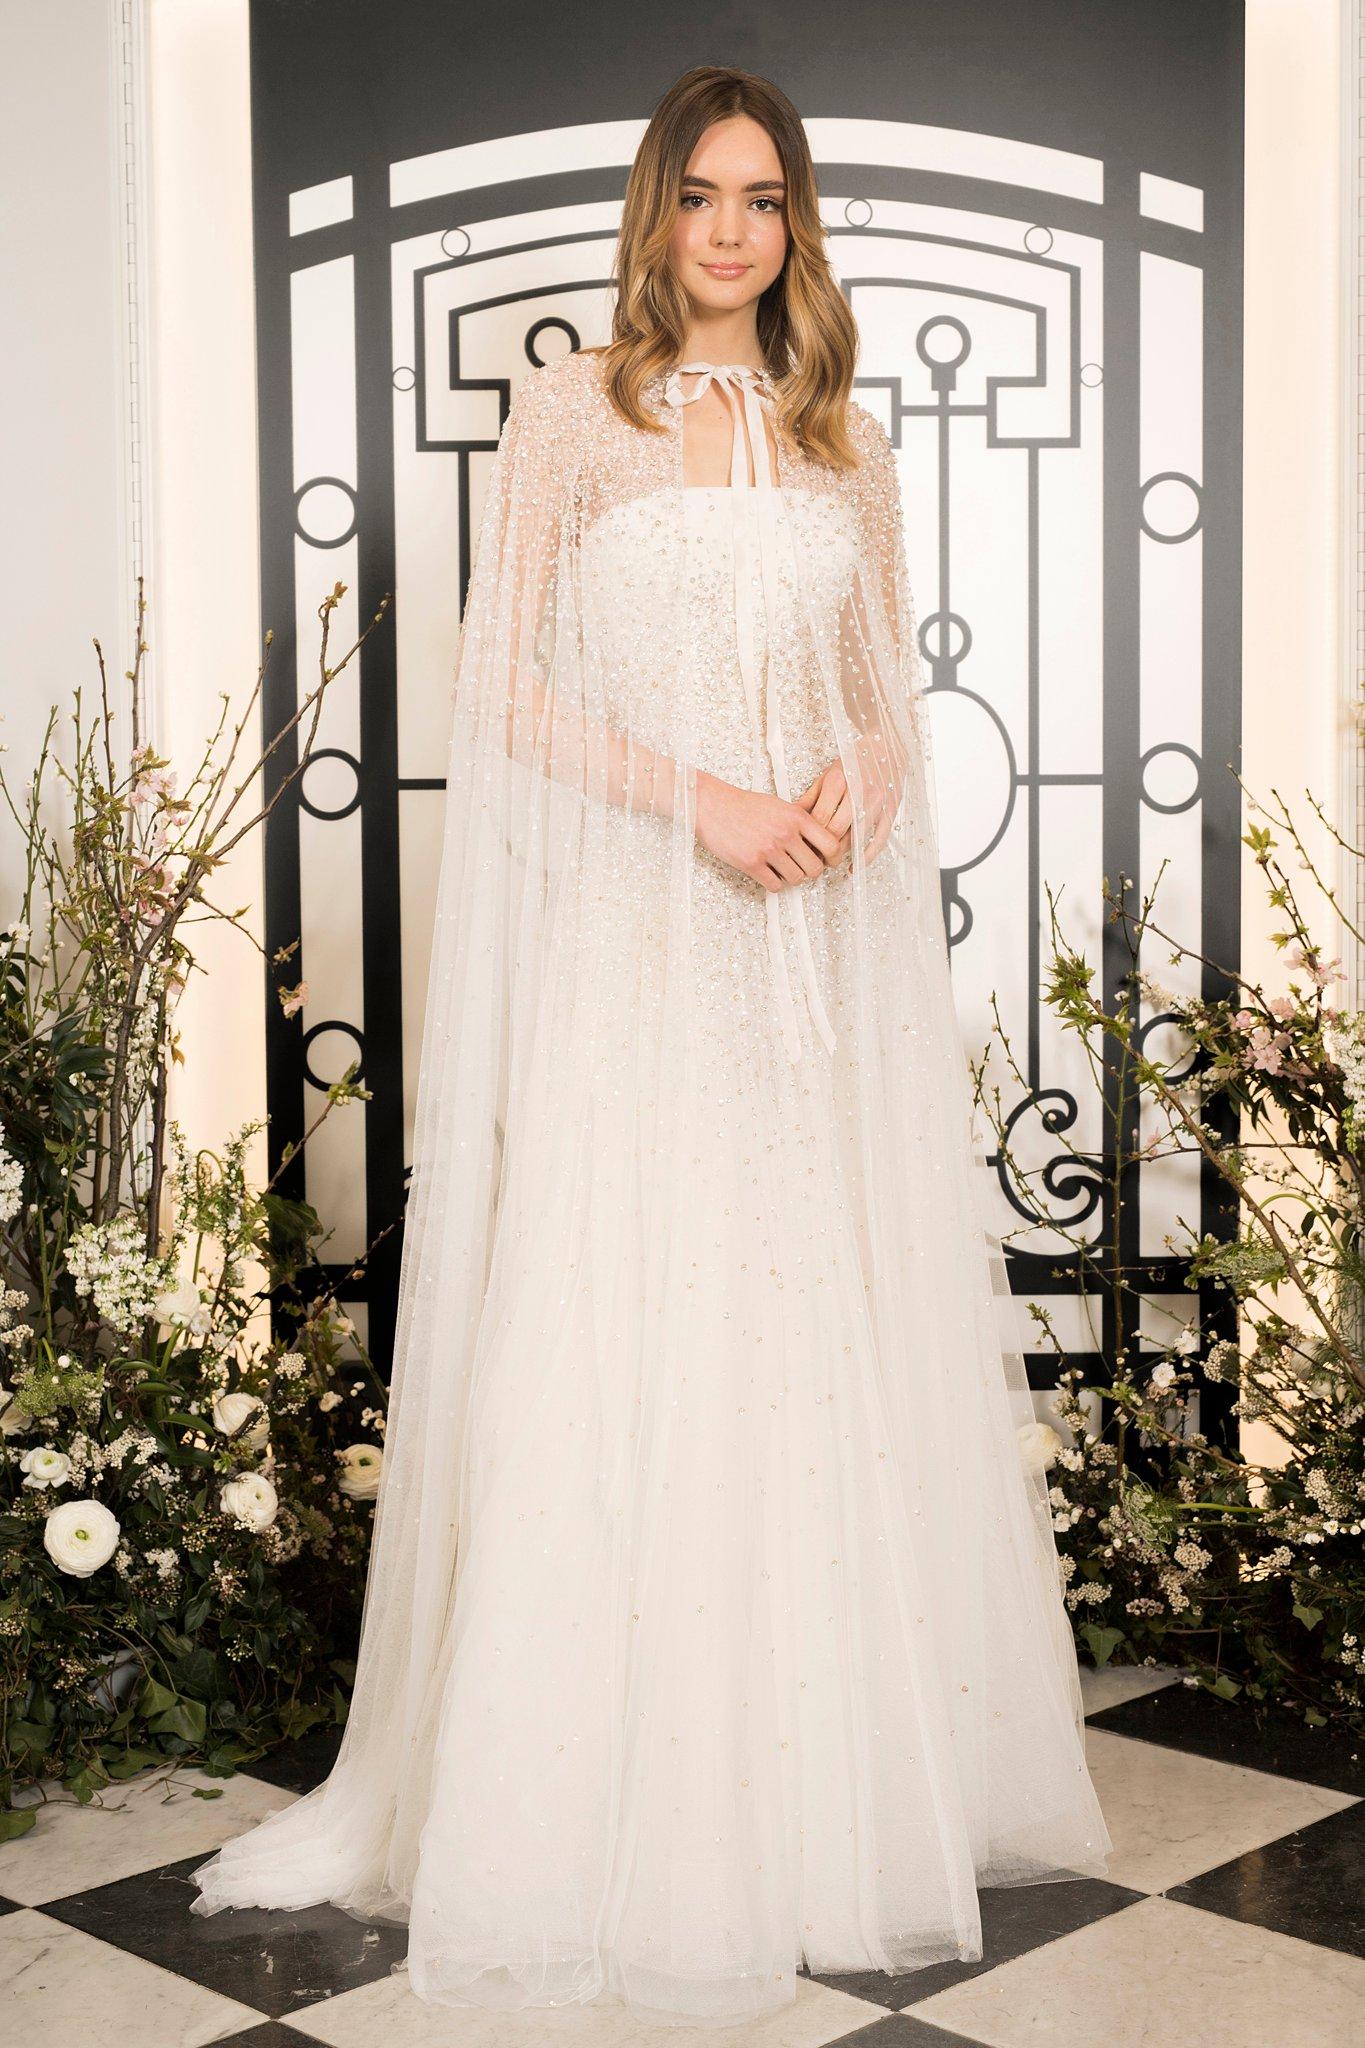 Most Read Blogs of 2019 - Devine Bride, wedding planner, Jenny Packham wedding dress